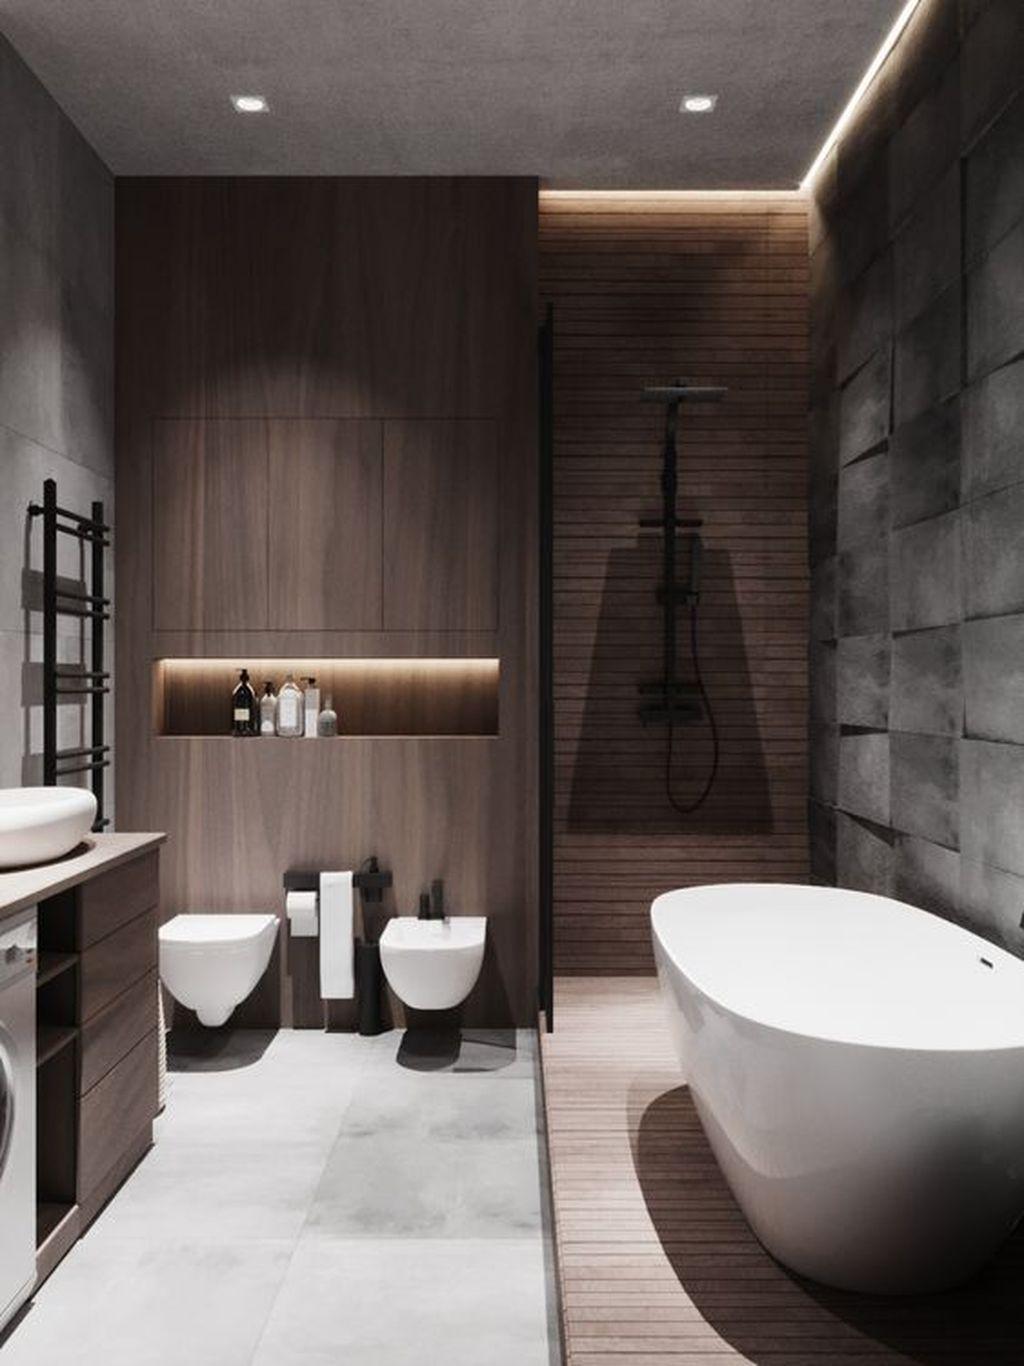 5 Modern Interior Design Concept To Add Luxury To Your Home Minimalist Bathroom Design Bathroom Interior Design Modern Bathroom Design Layout Amazing concept modern bathroom